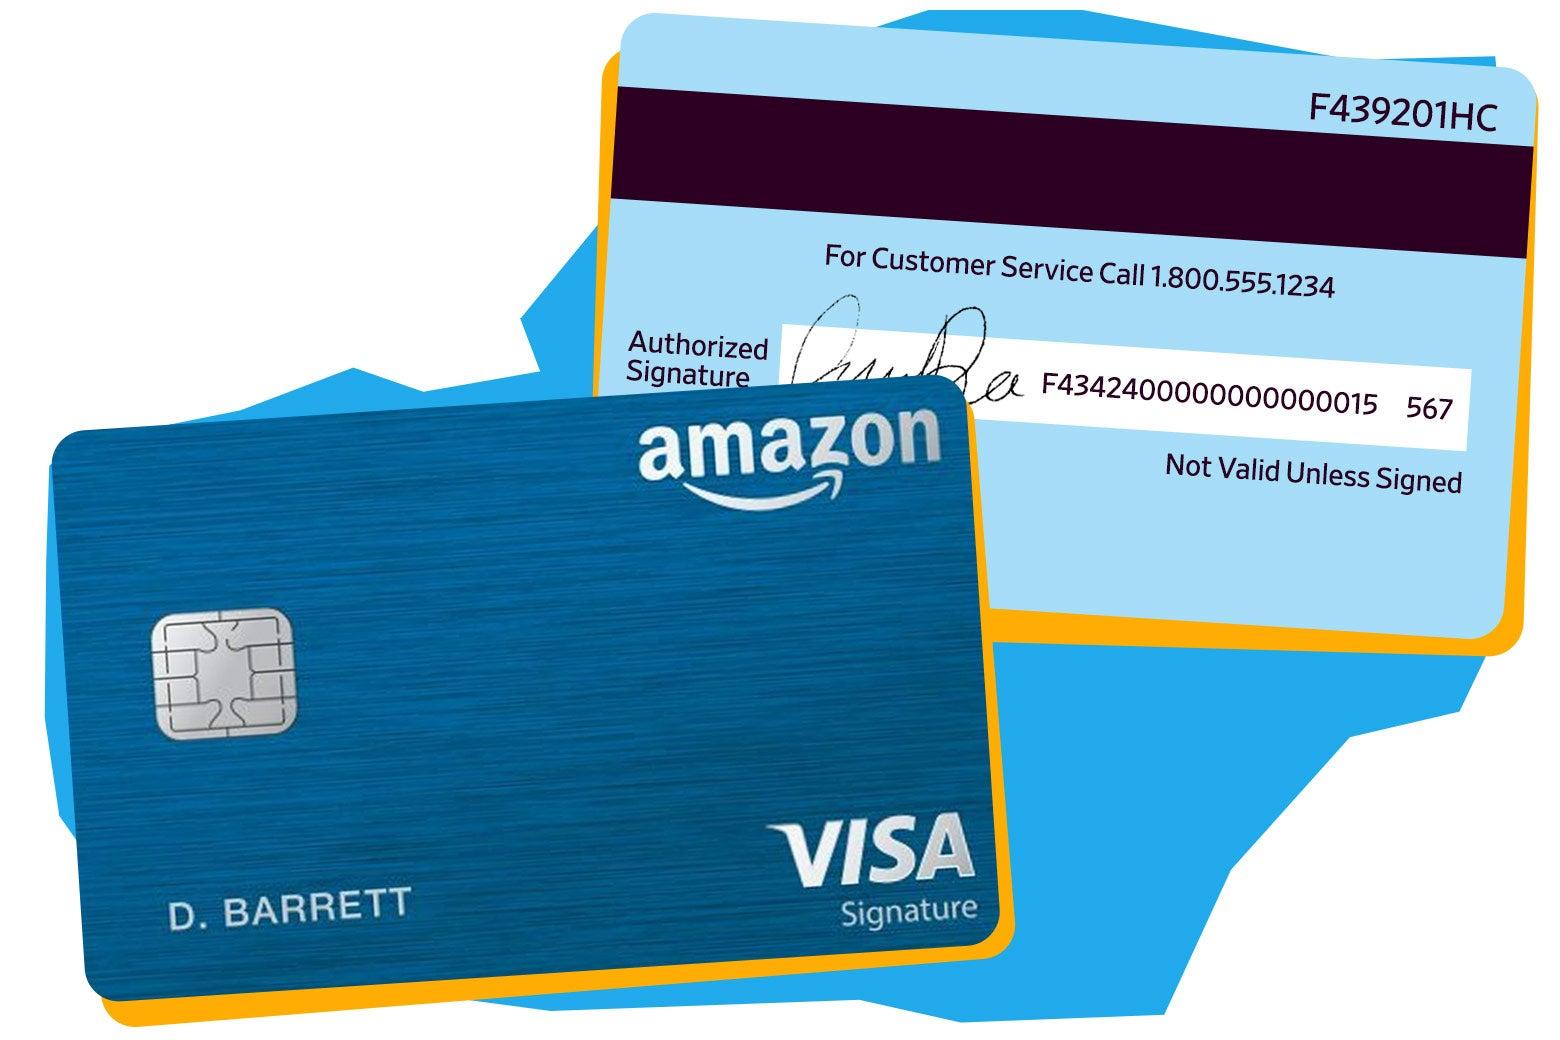 Capital one credit card telephone no